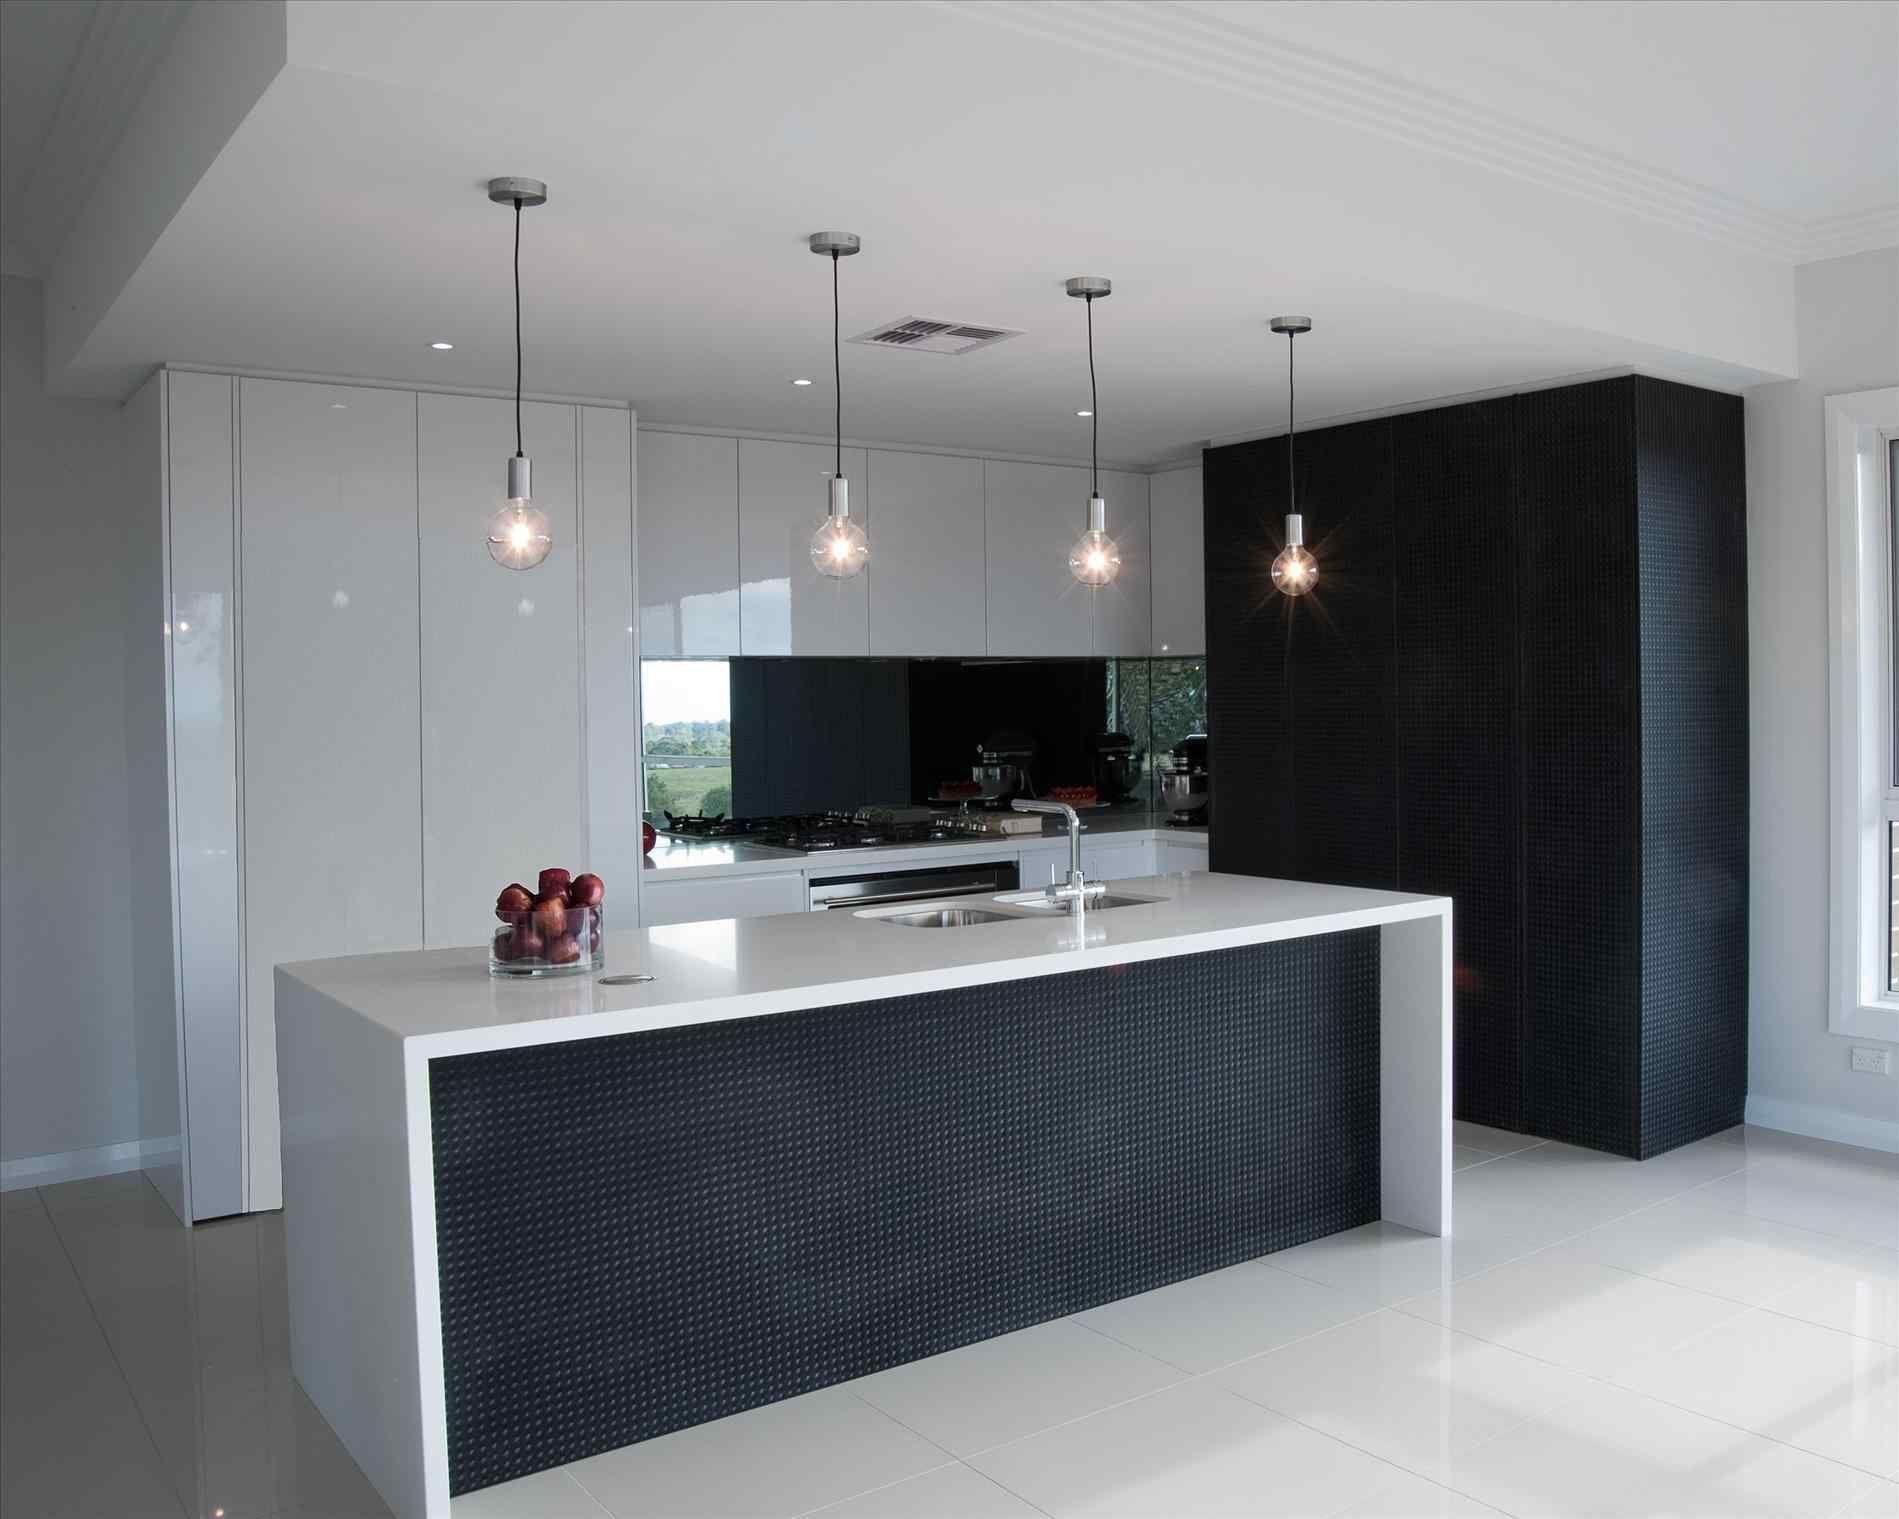 Awesome 13 Black Shiny Kitchen Cabinets Ideas For Stunning Kitchen Breakpr Modern Kitchen Design White Modern Kitchen Black Kitchen Cabinets